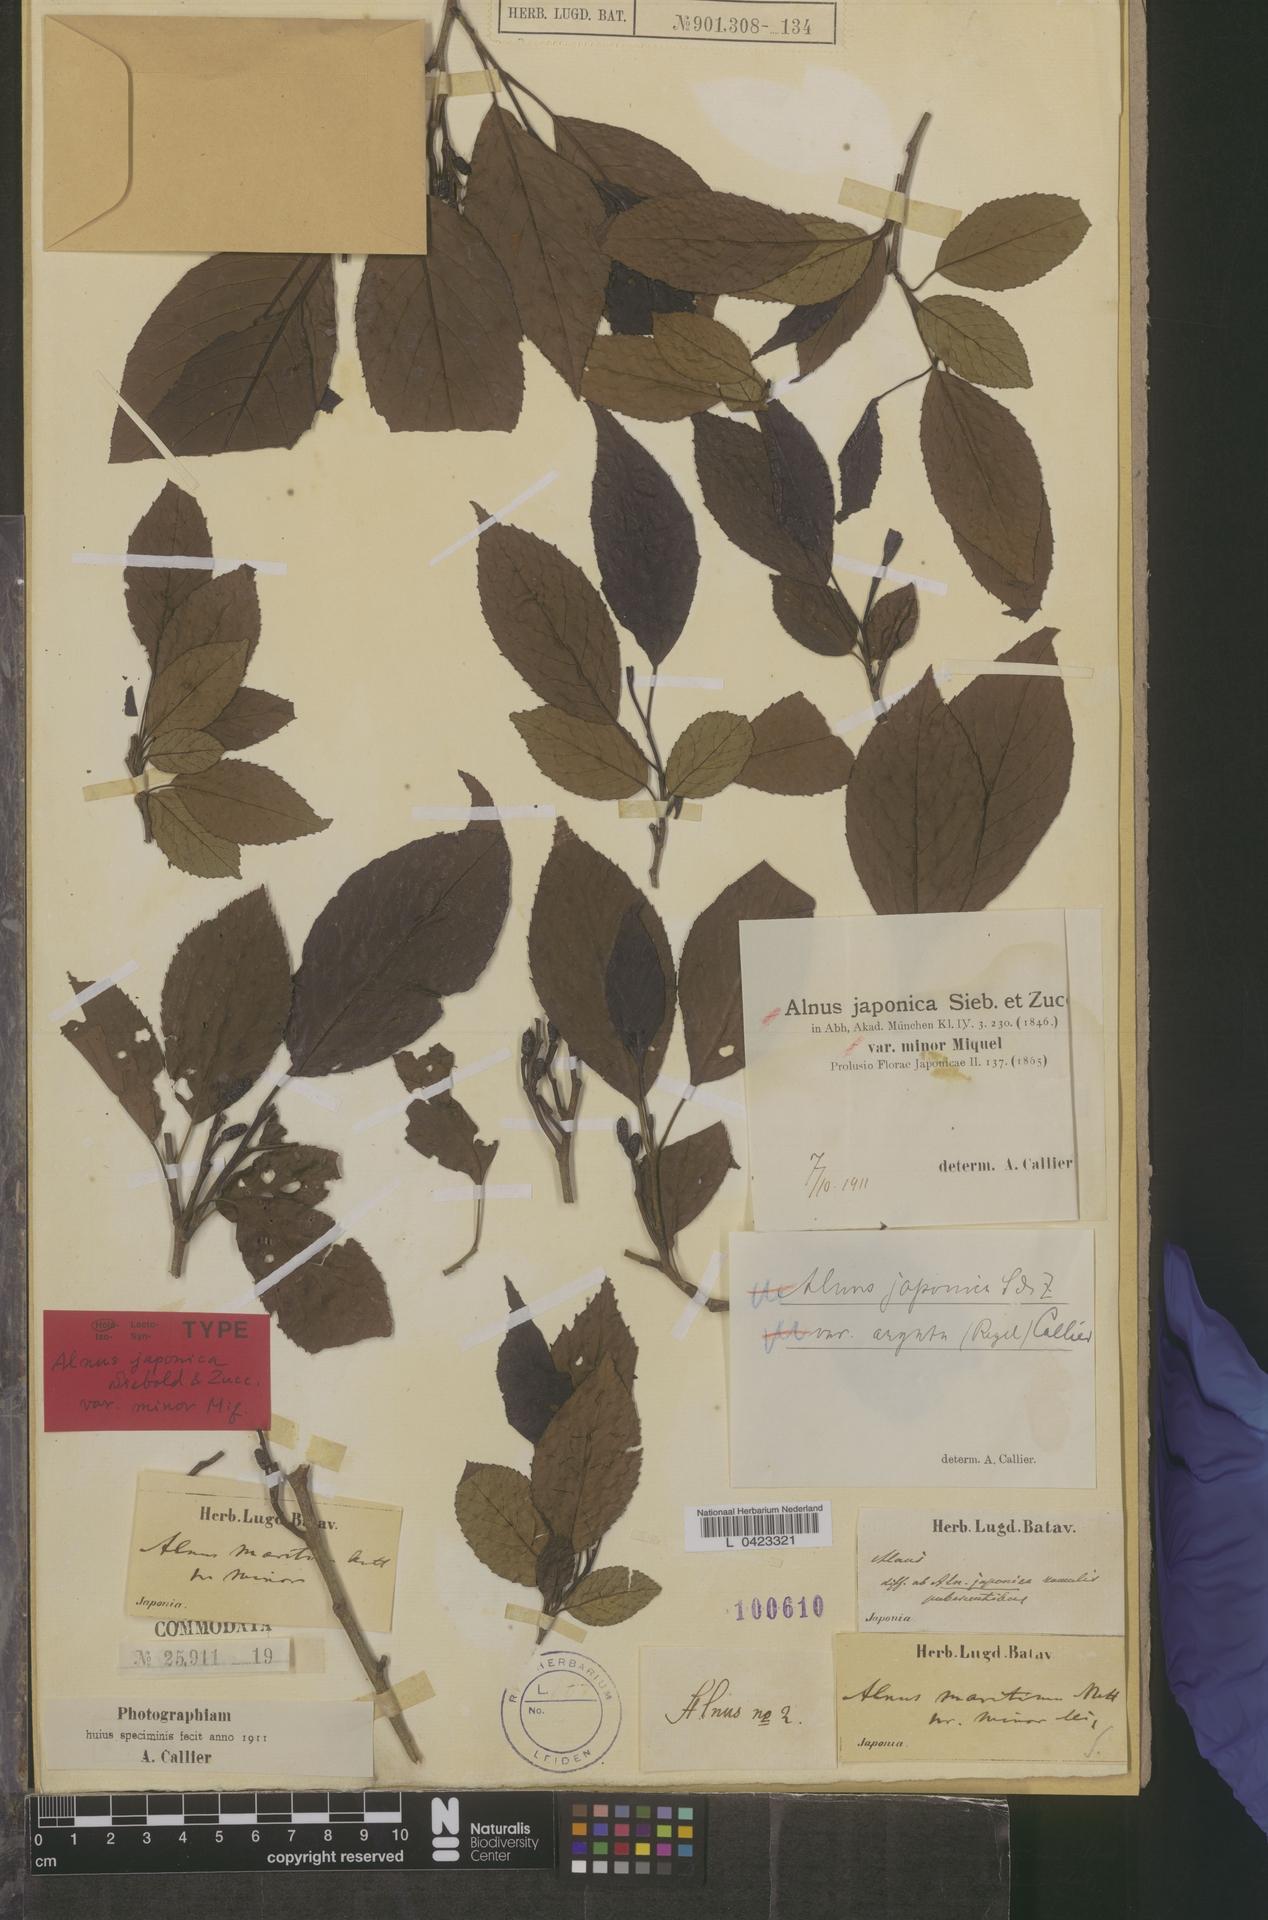 L  0423321 | Alnus japonica var. minor Miq.